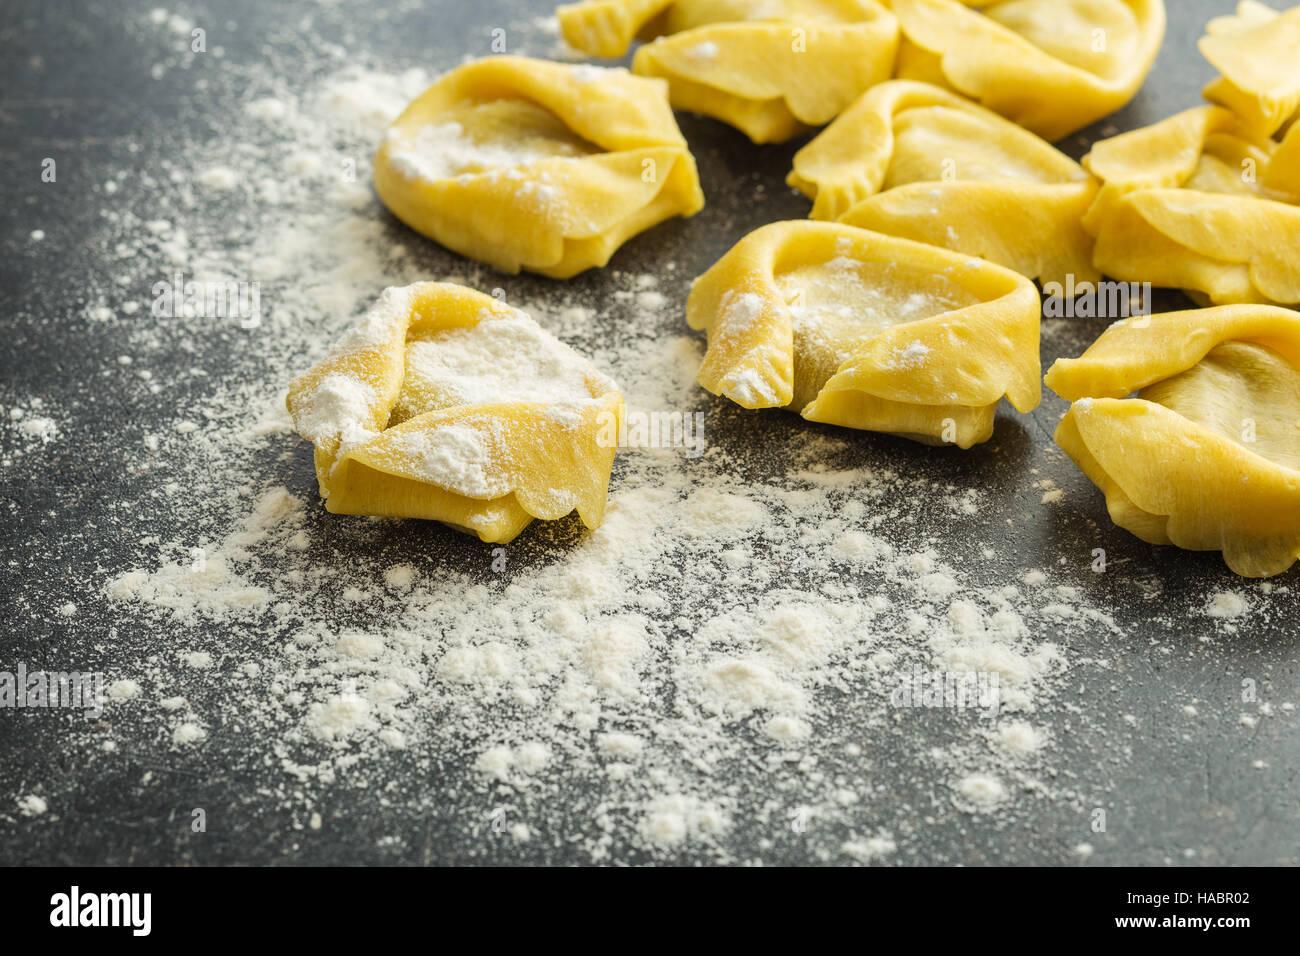 Italian traditional tortellini pasta and white flour. - Stock Image